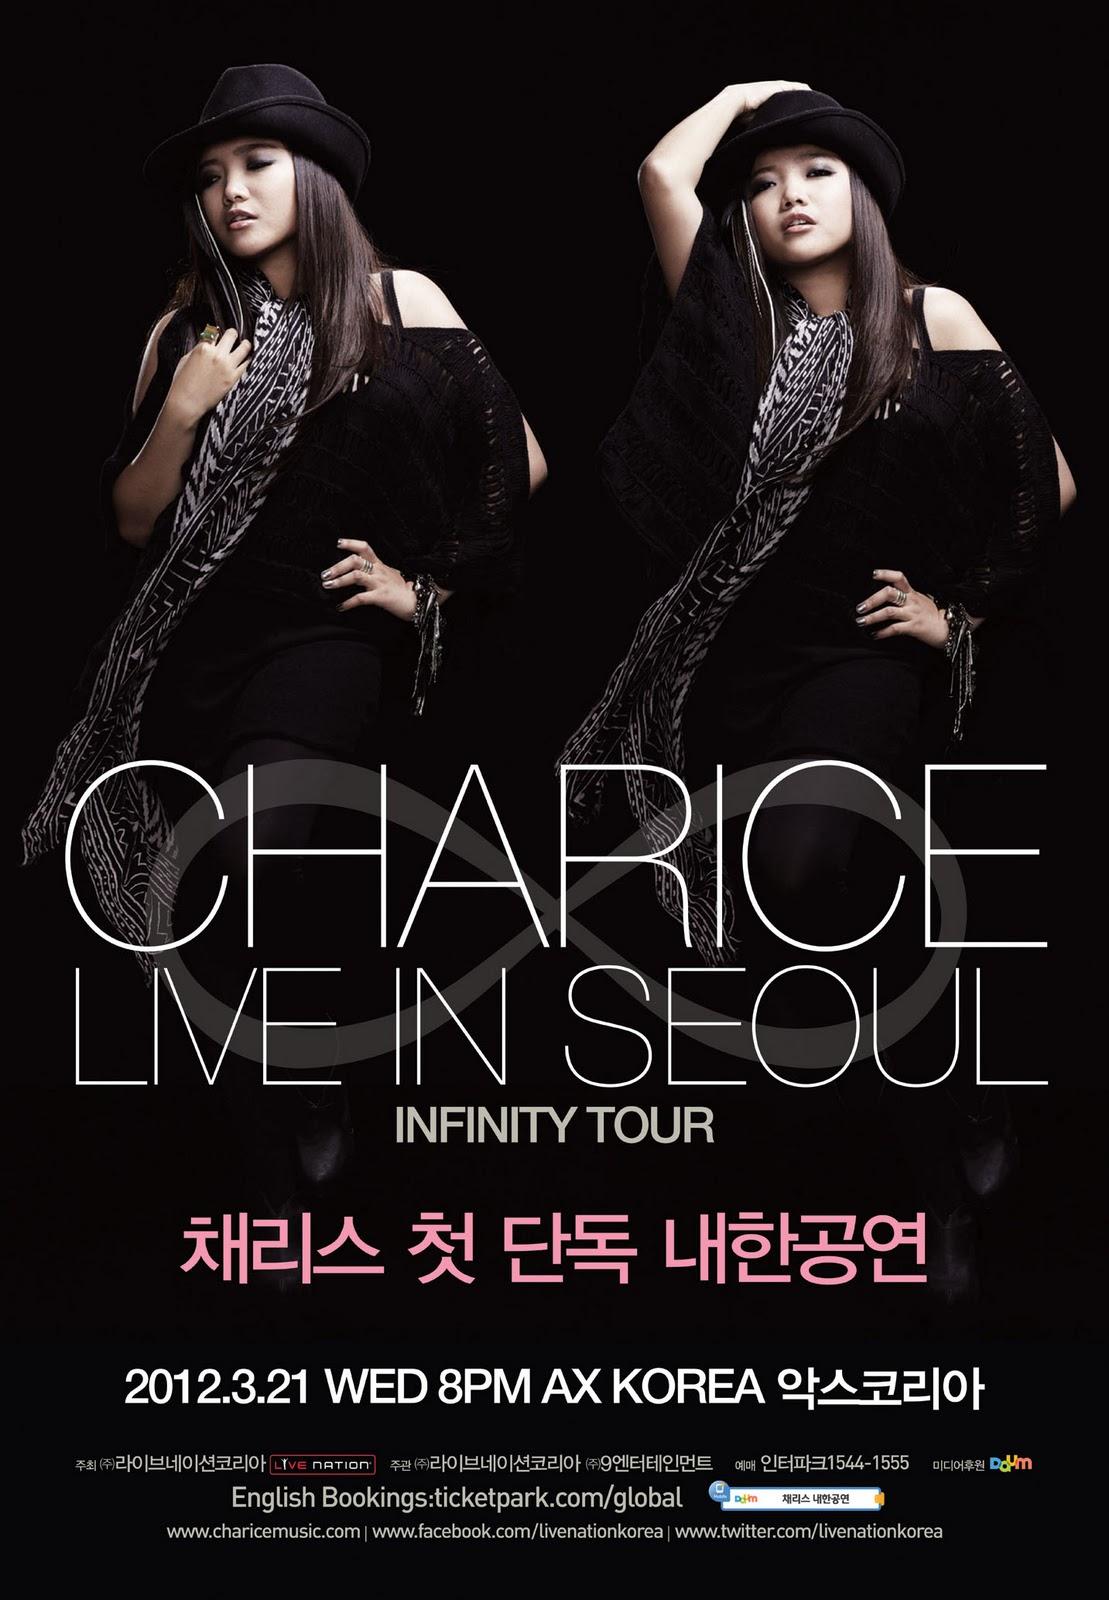 Charice Infinity